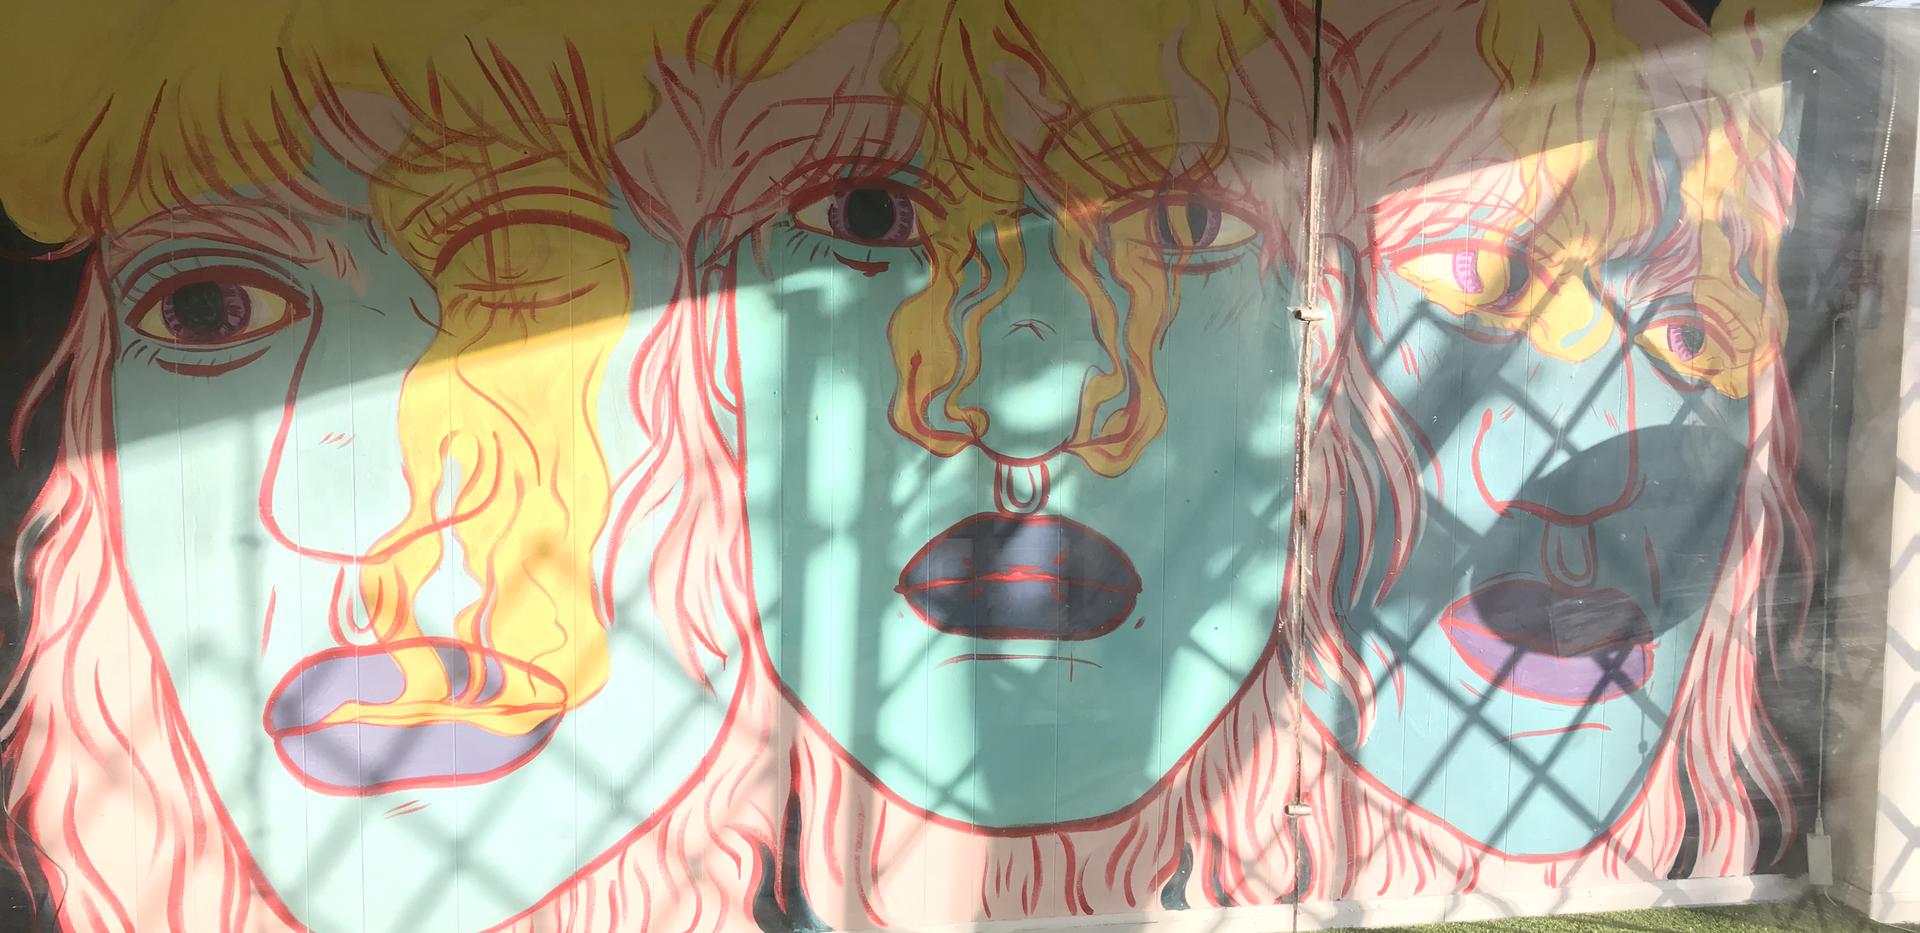 2019 Tell Me How You Feel window installation KO Gallery, Hamtramck, MI